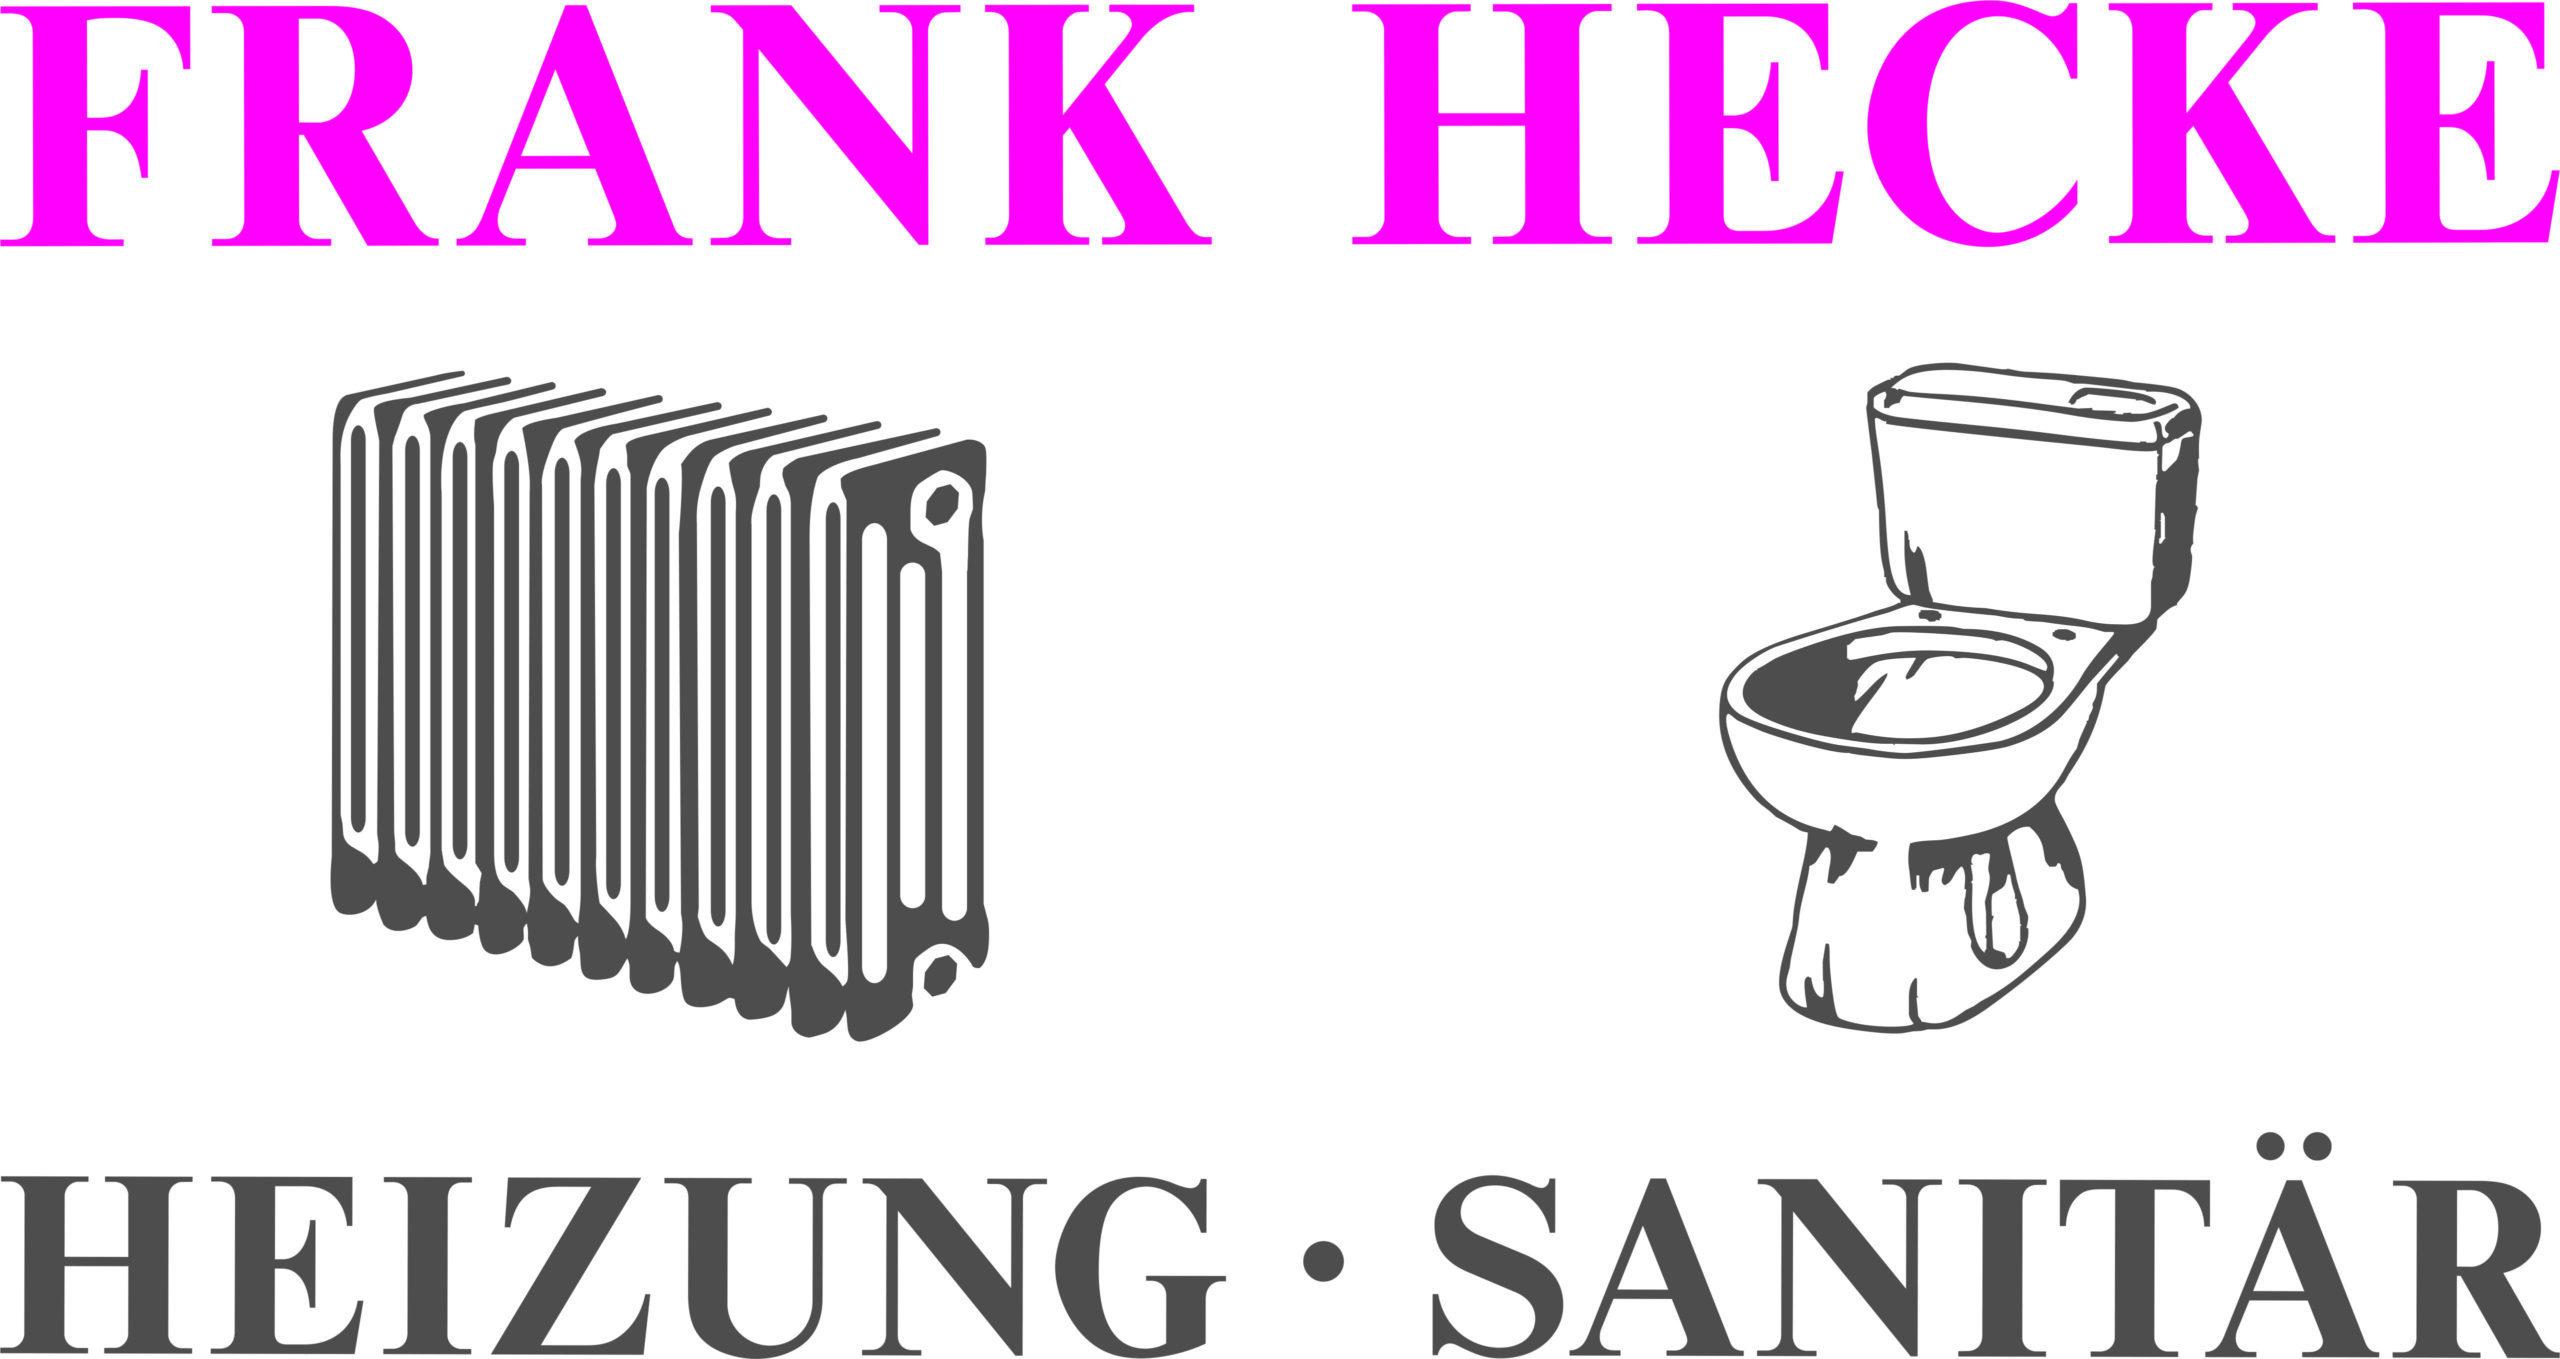 Frank Hecke